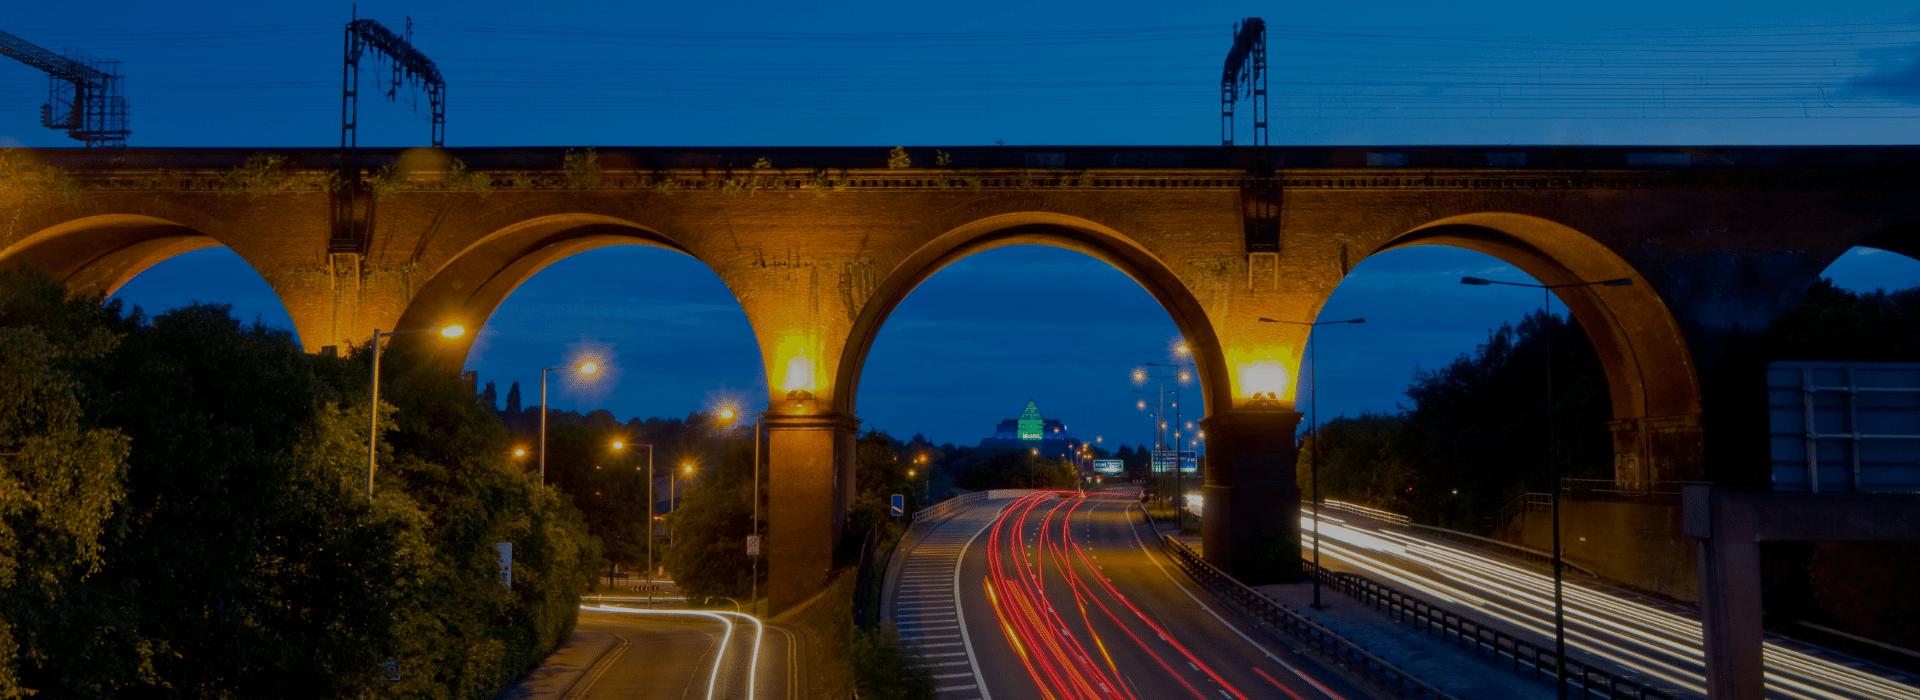 Stockport Railway Viaduct